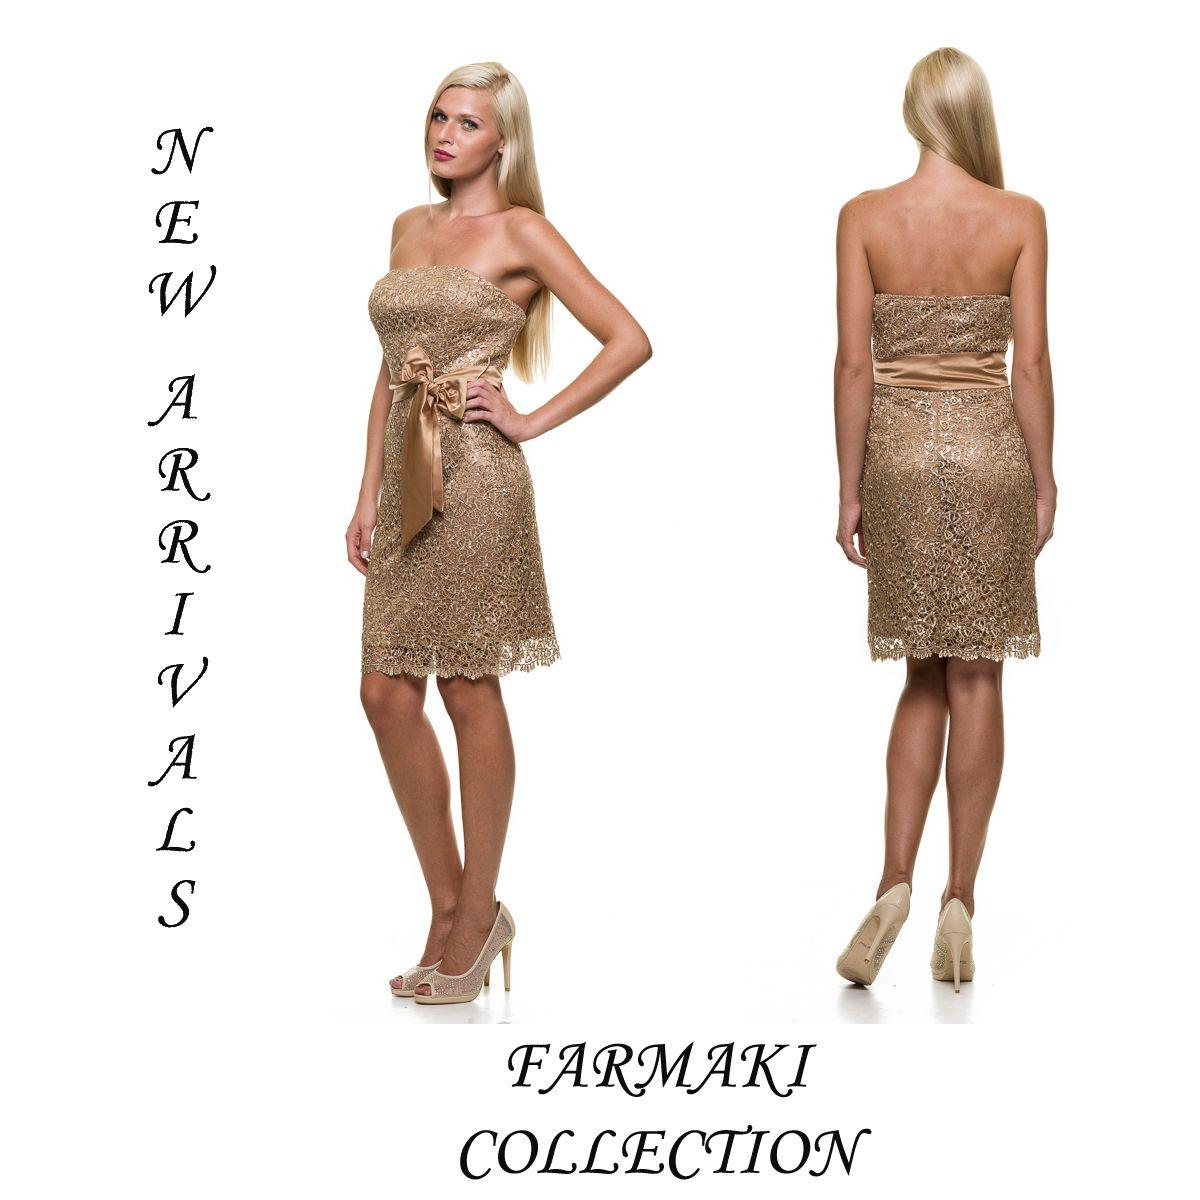 f4e394625f8 Φόρεμα κοντό, ίσια γραμμή, στράπλες ή με ράντες, σατέν ζώνη. 'Υφασμα ...